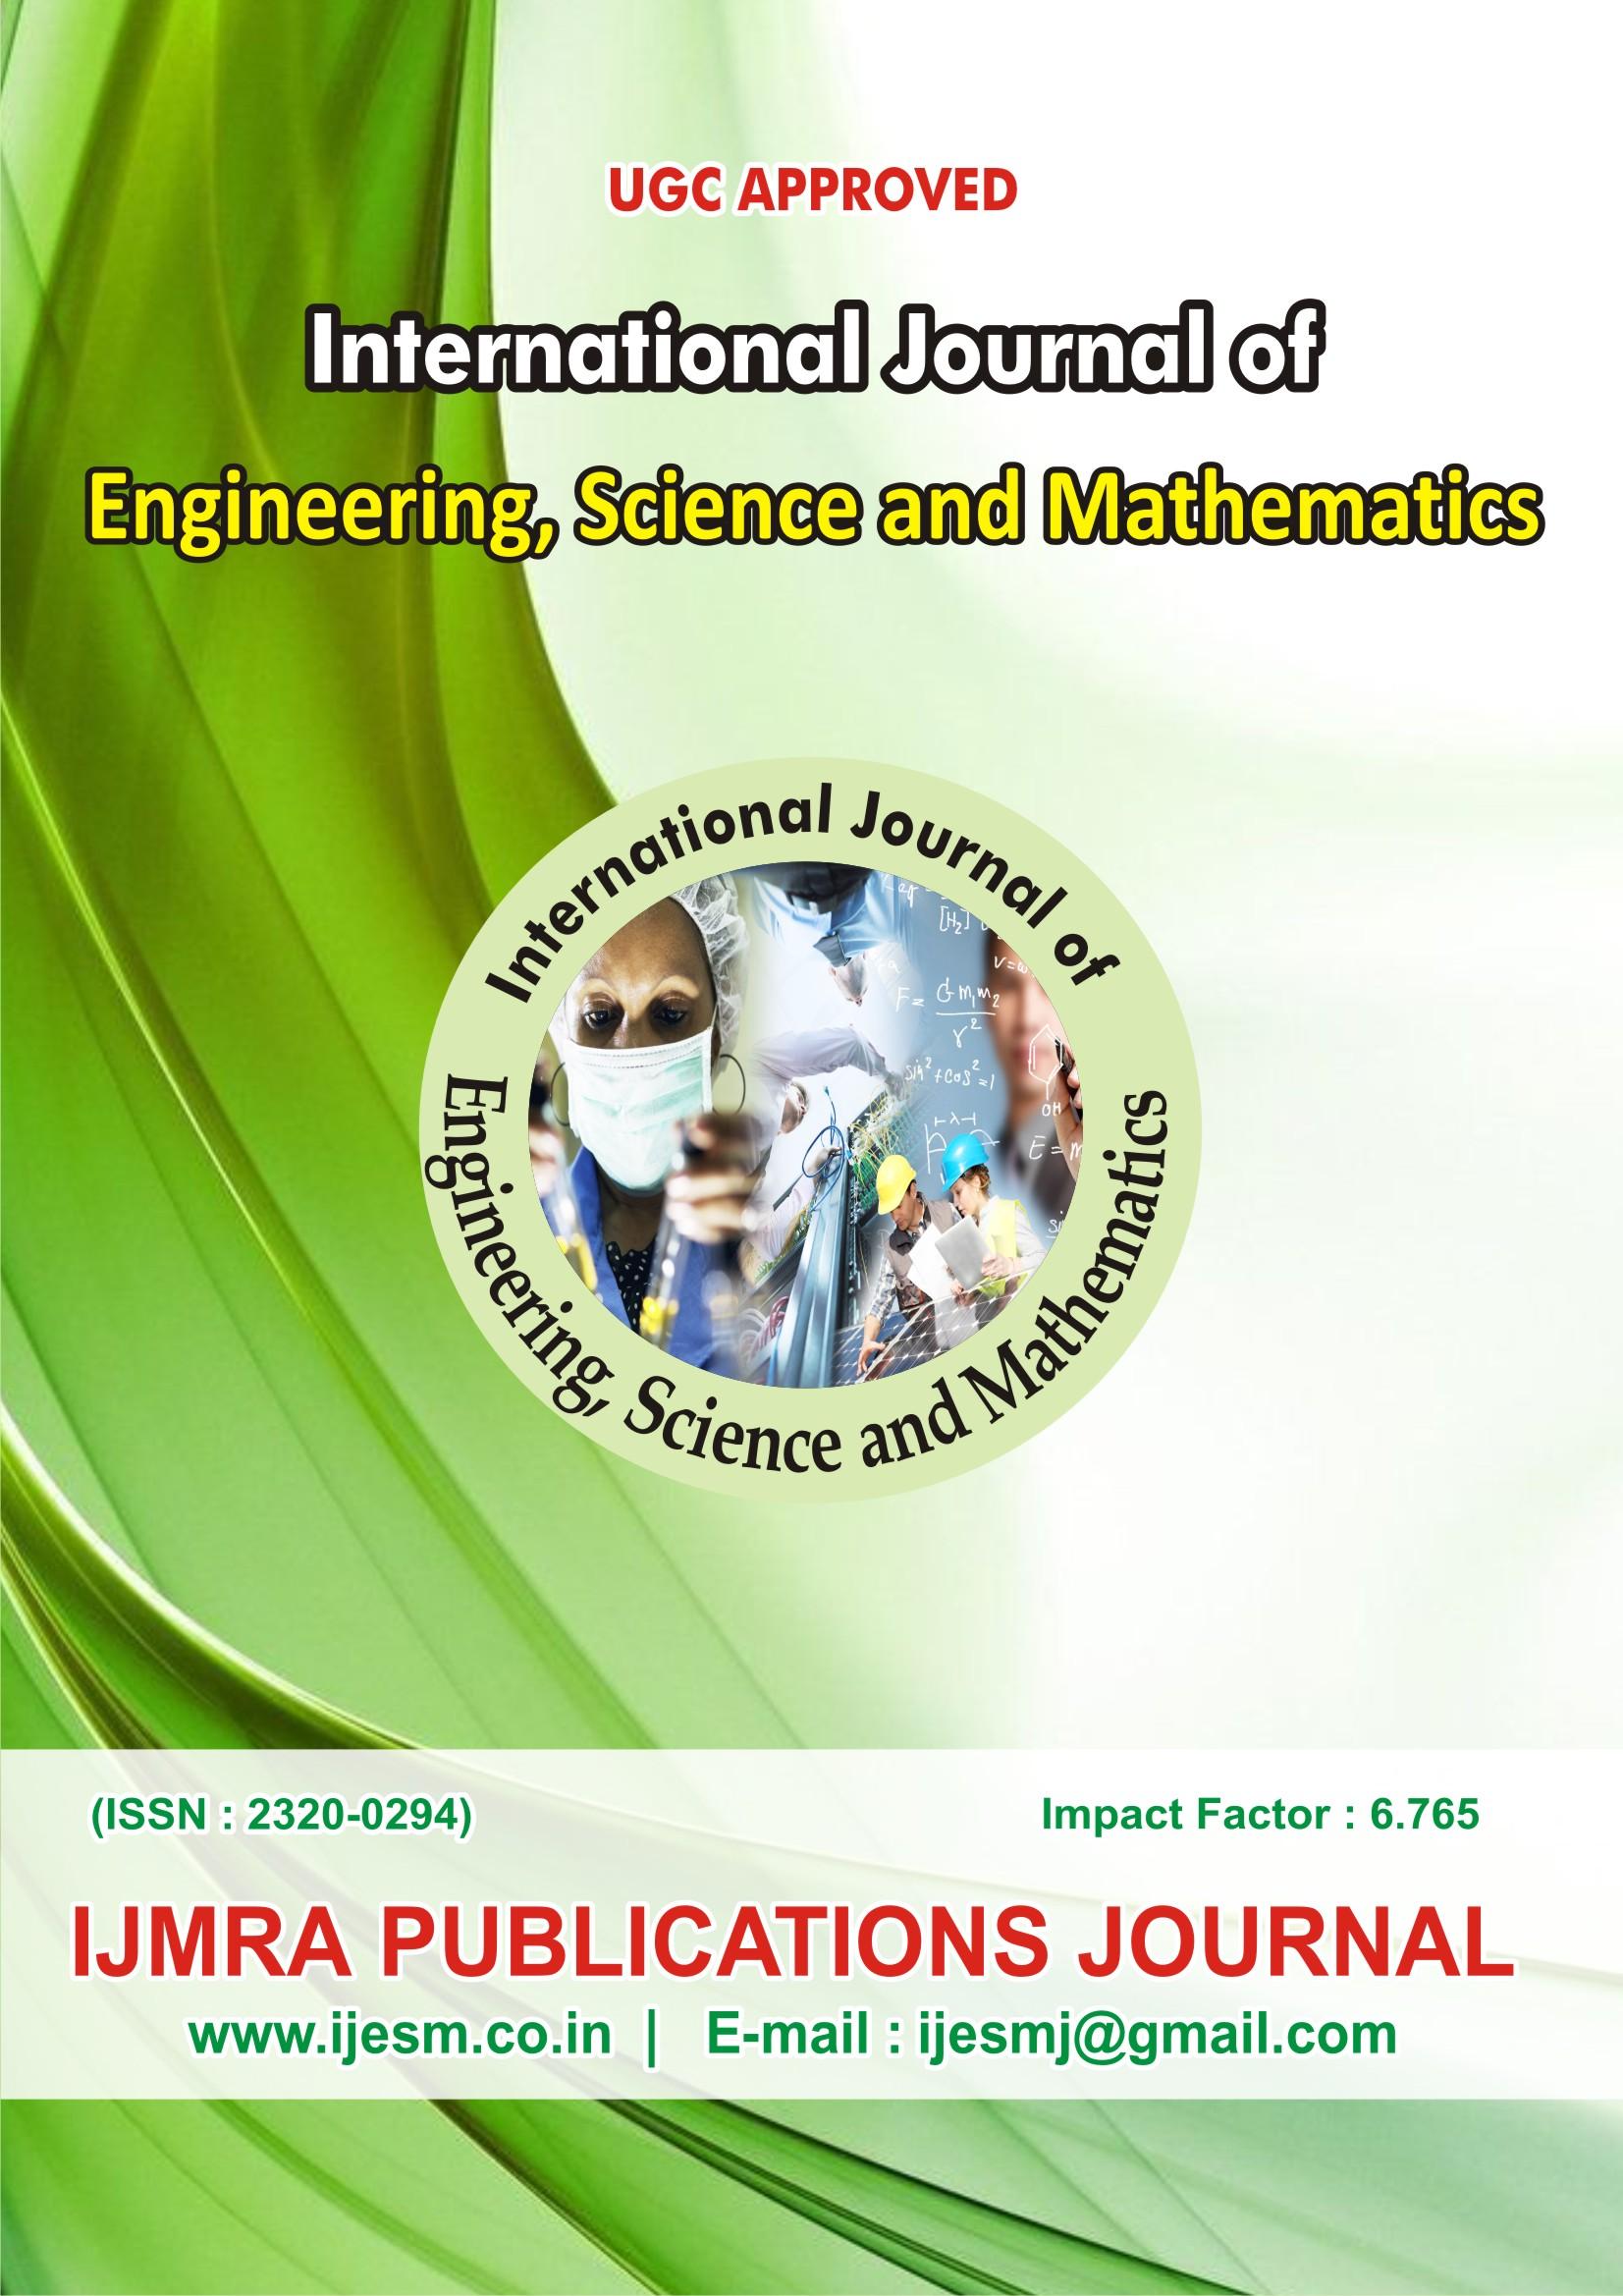 International Journal of Engineering, Science and Mathematics